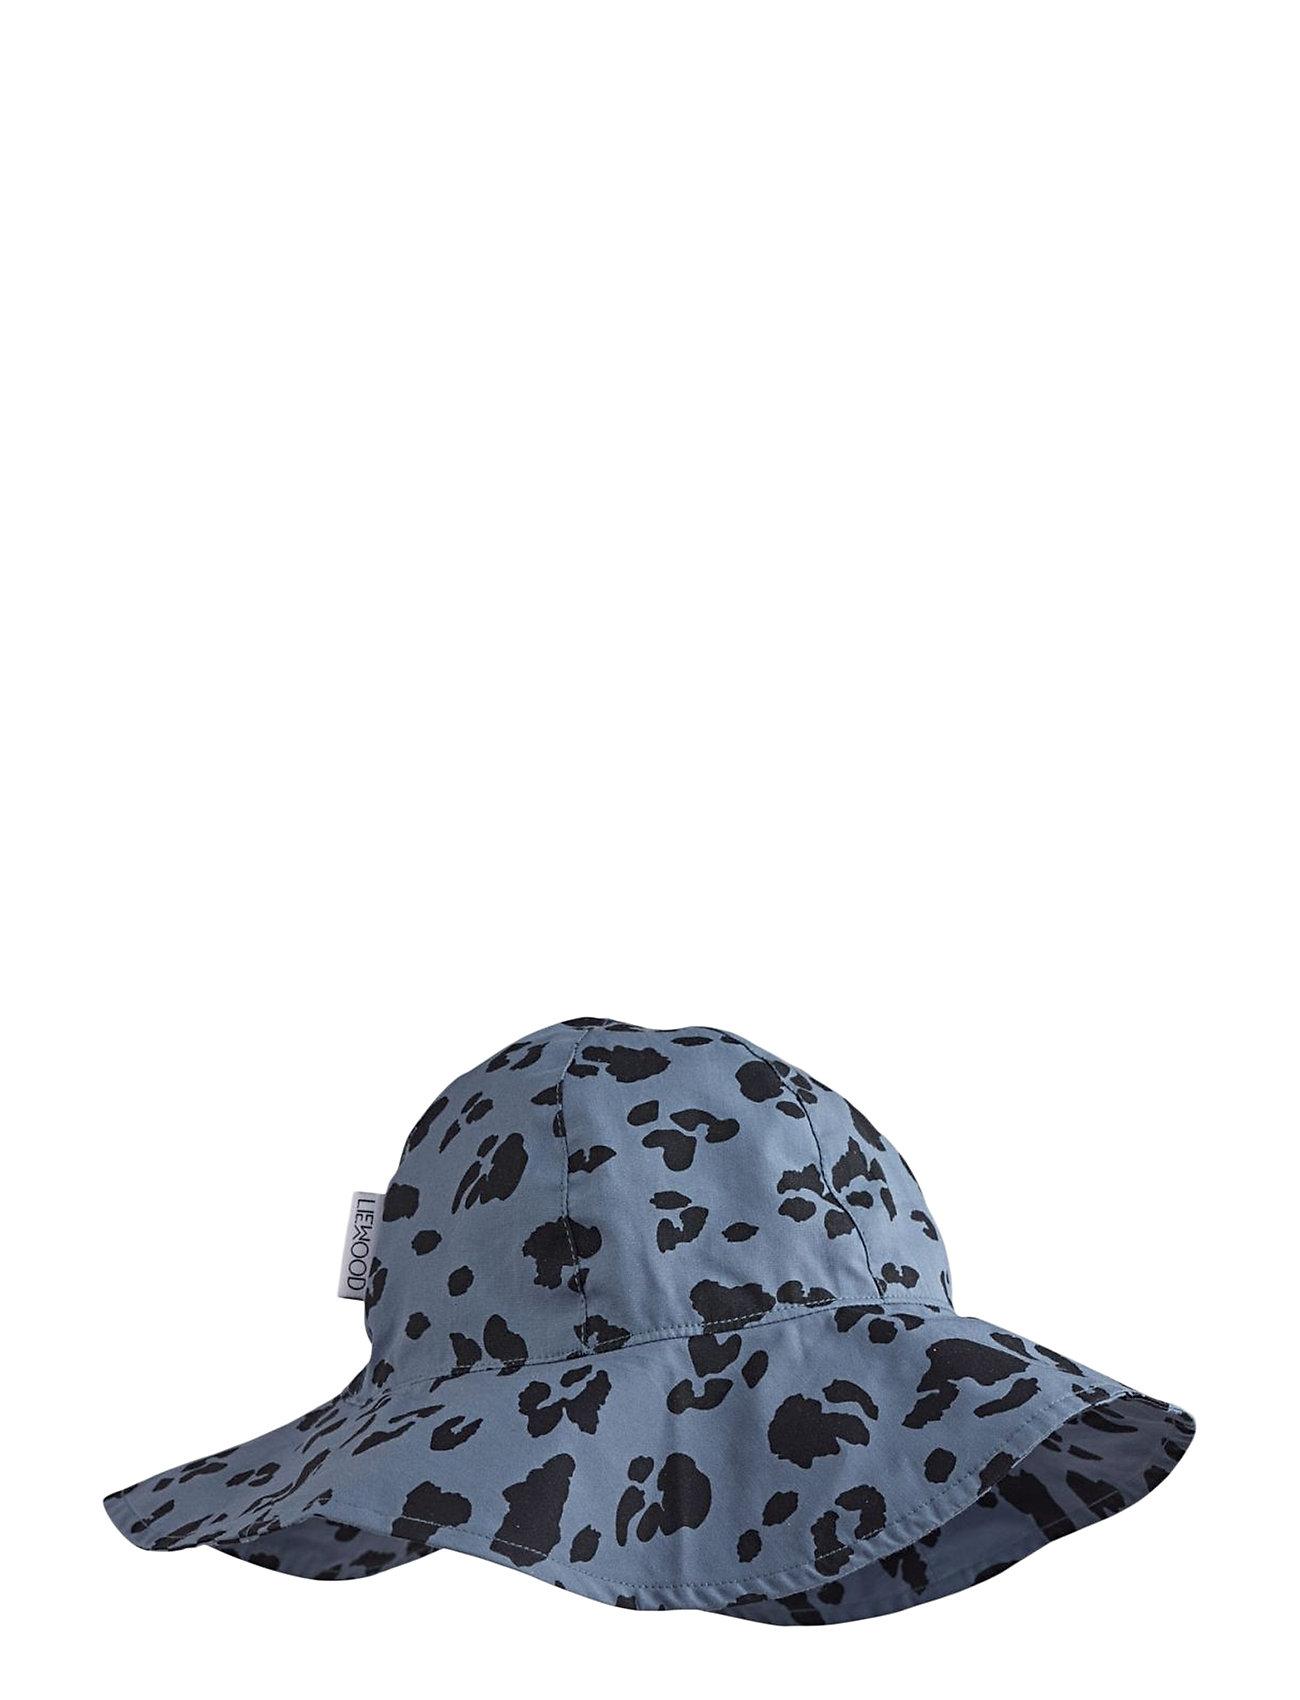 Liewood Amelia sun hat - LEO BLUE WAVE